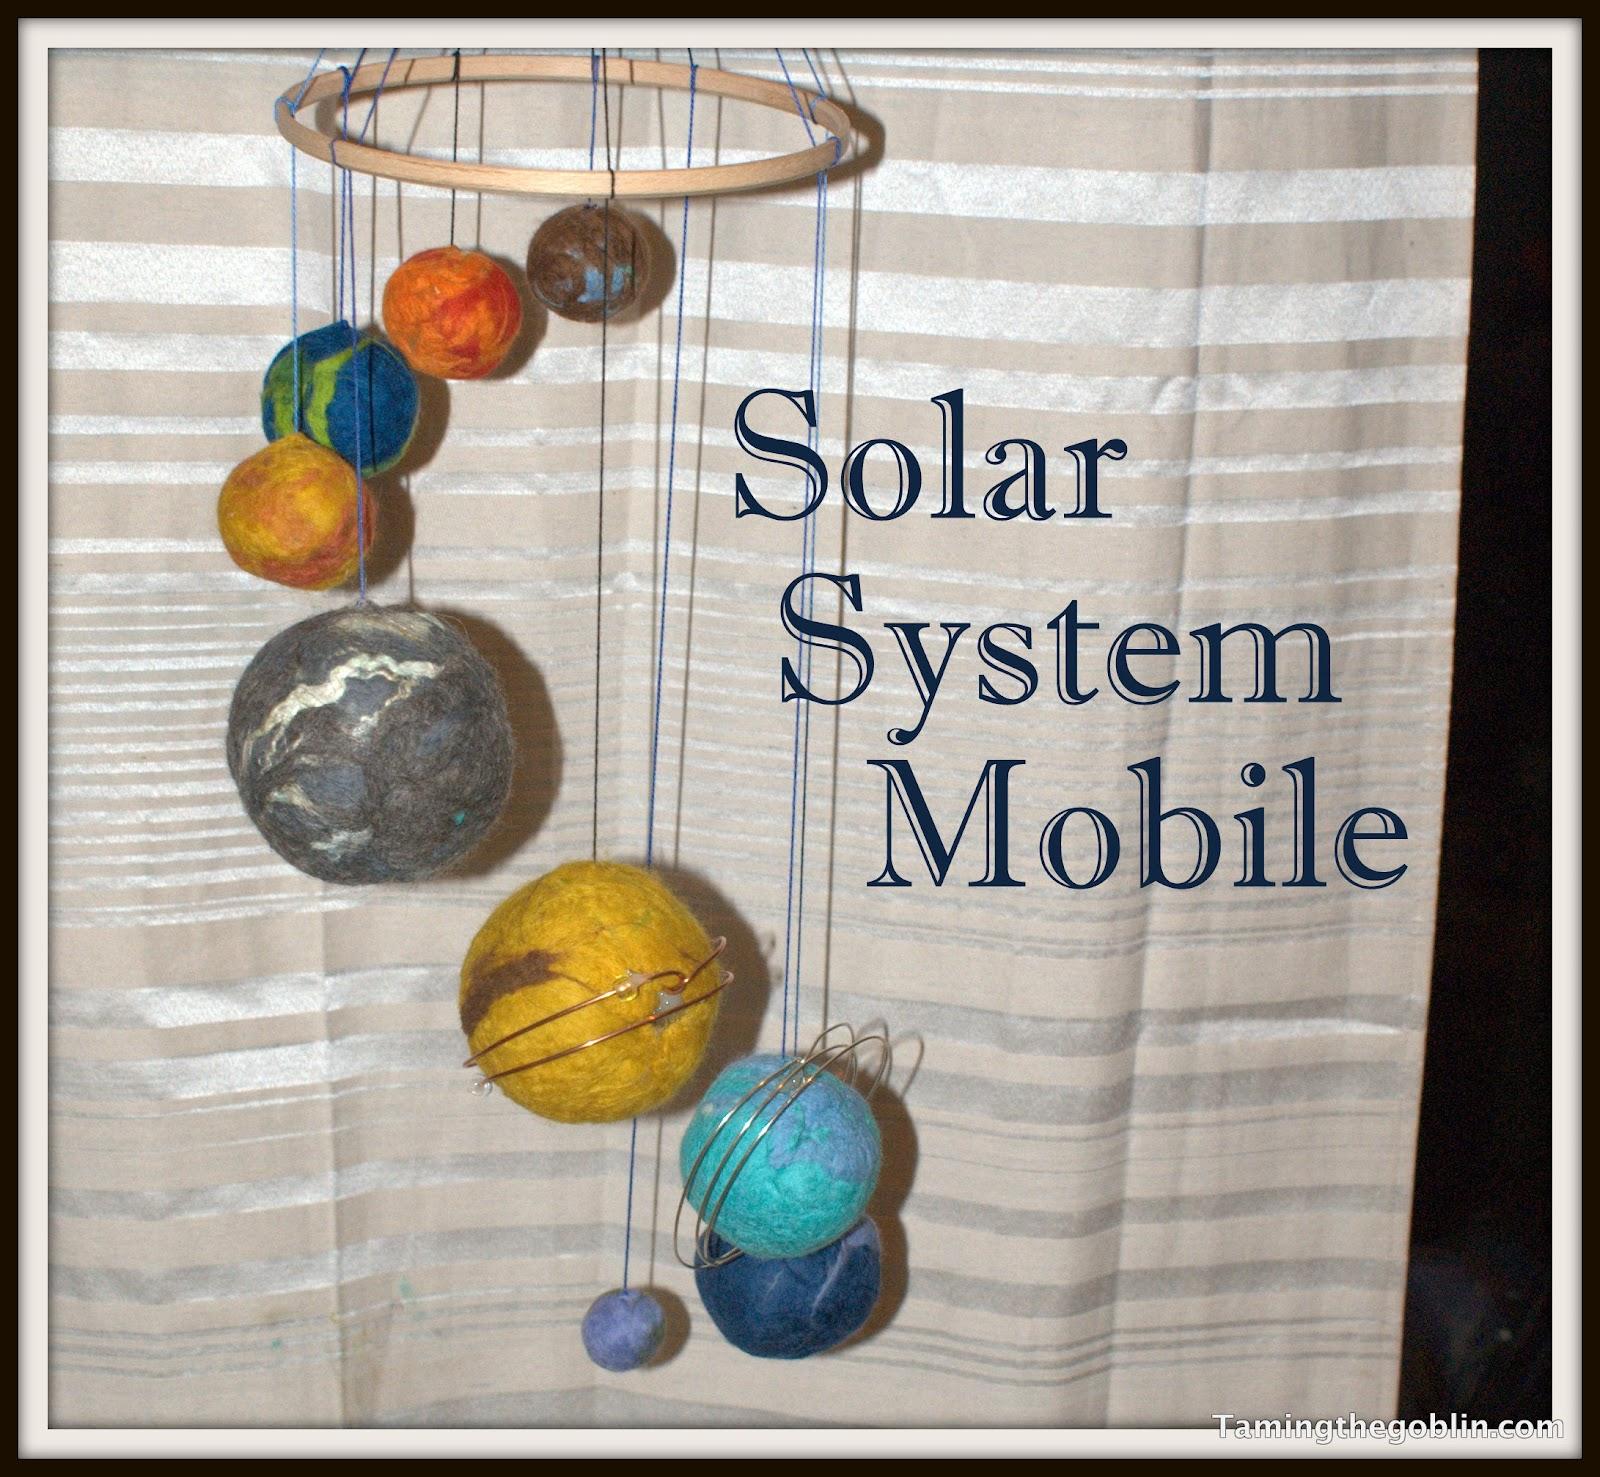 Taming the Goblin: Solar System Mobile